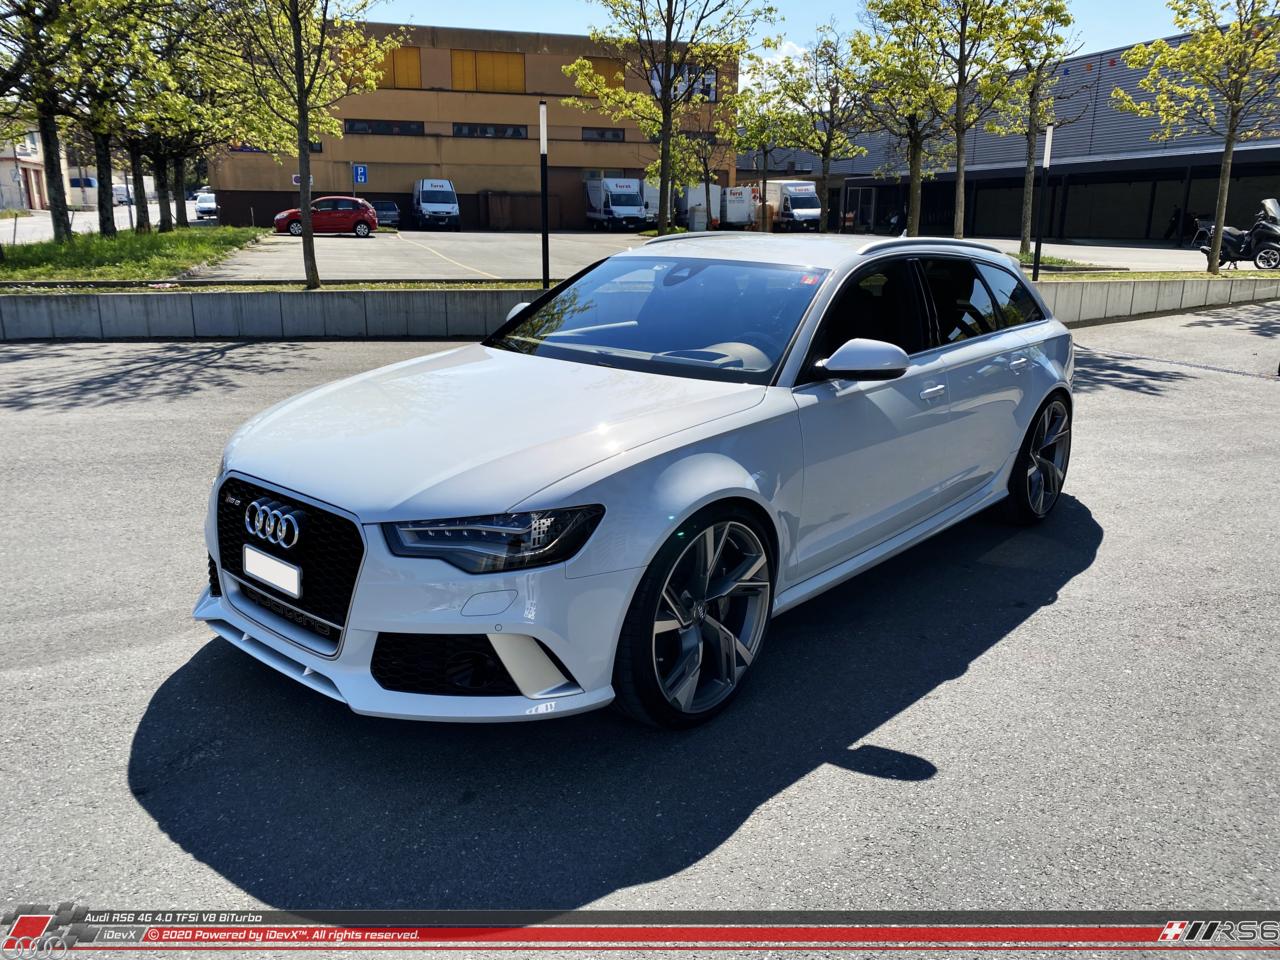 24.04.2020_Audi-RS6_iDevX_000.png